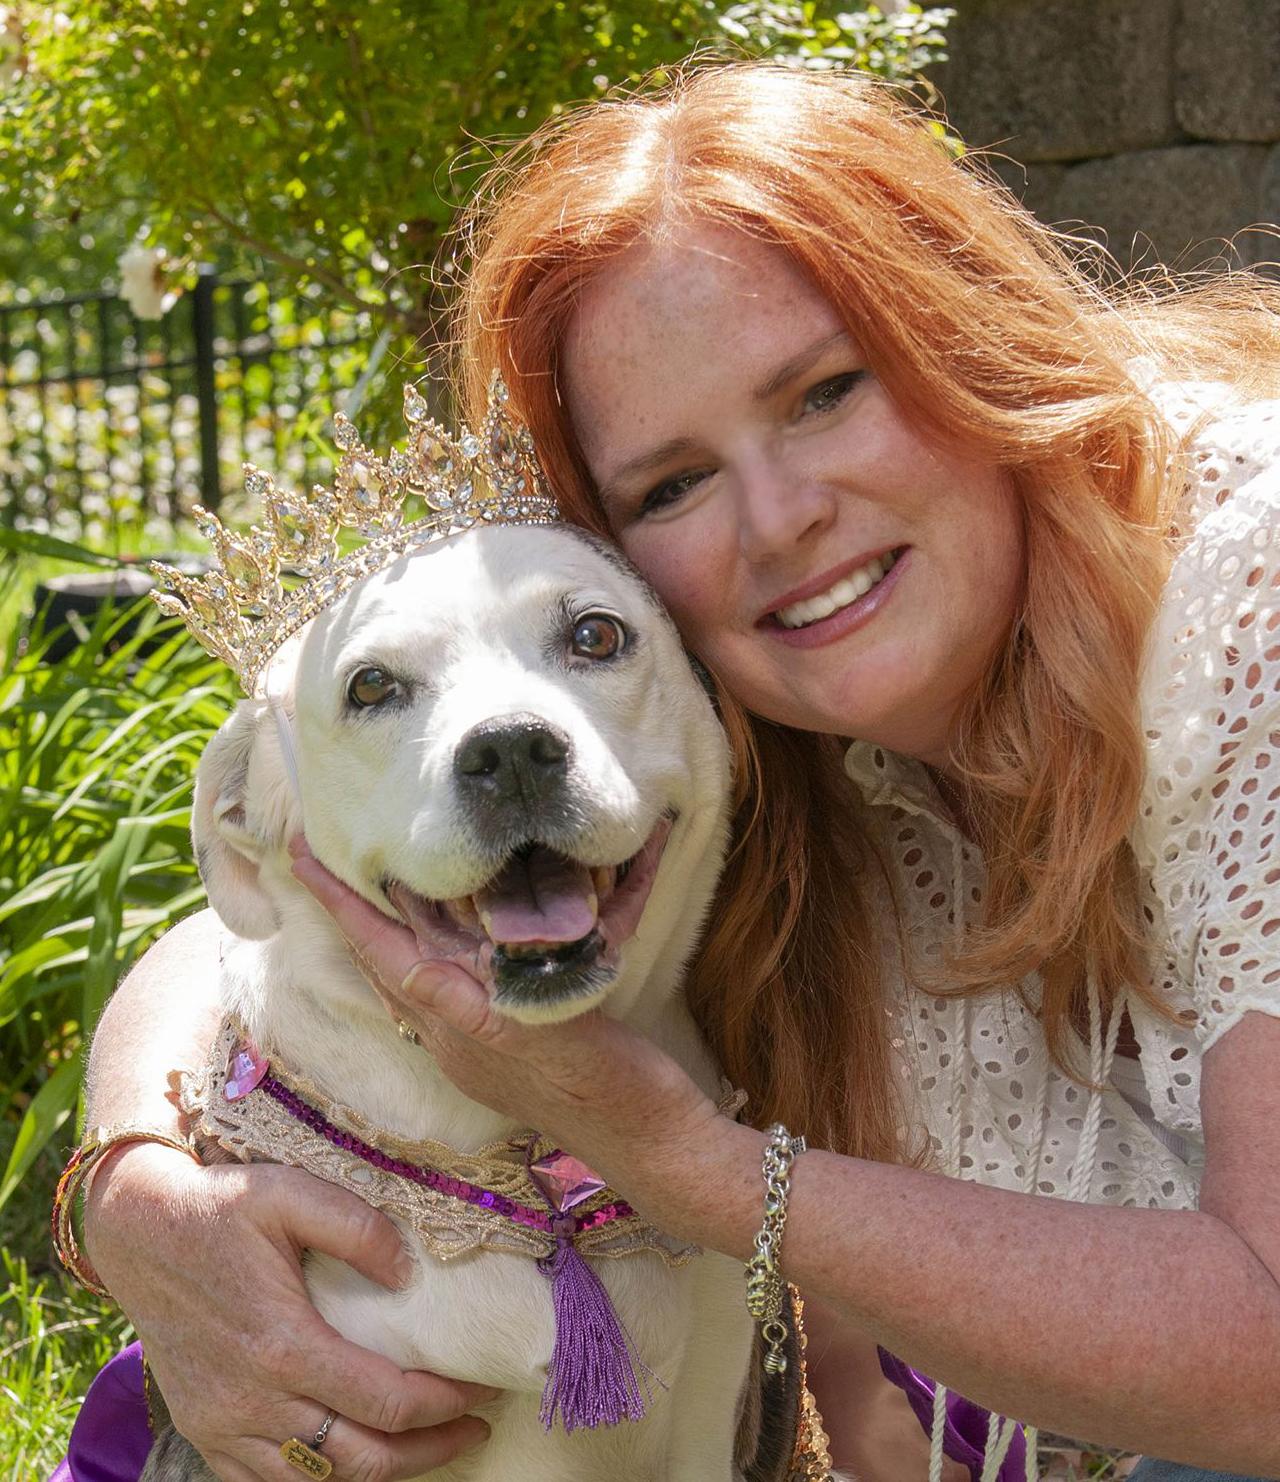 Nicole Elizabeth with her beloved rescue dog Darla